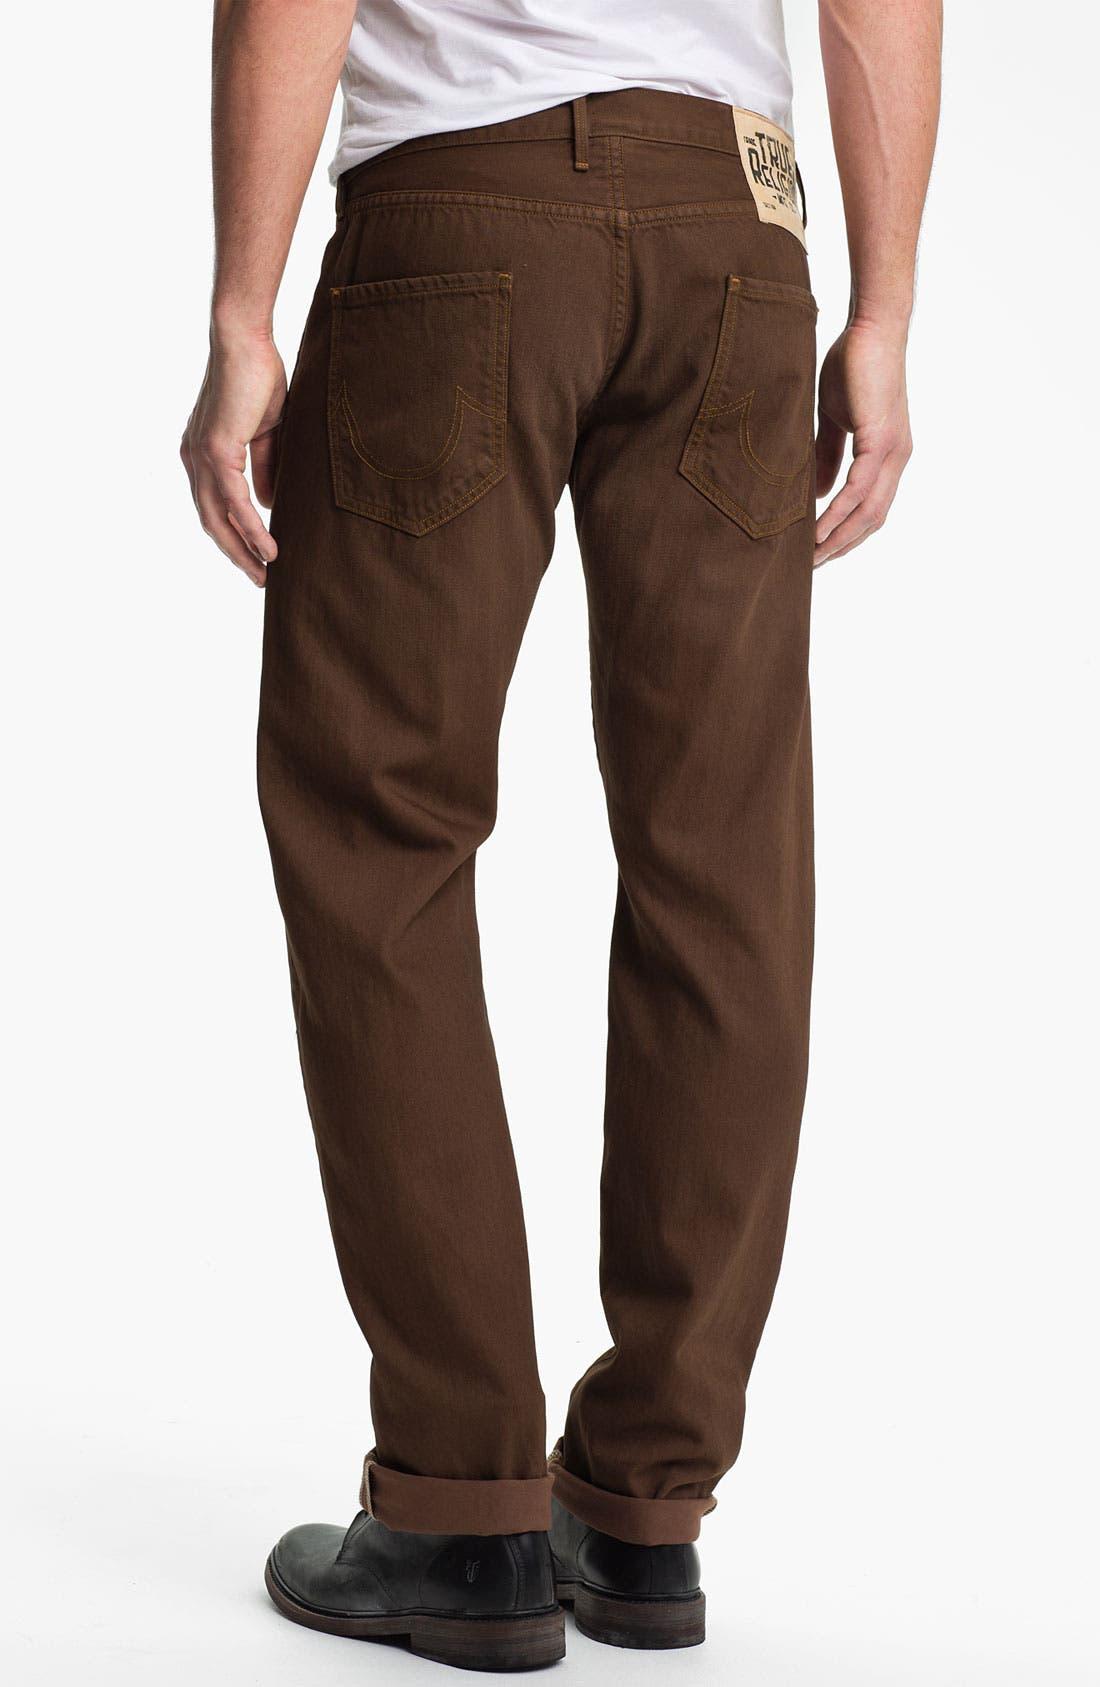 Main Image - True Religion Brand Jeans 'Geno Blue Collar Crossroads' Slim Straight Leg Jeans (Kona Brown)